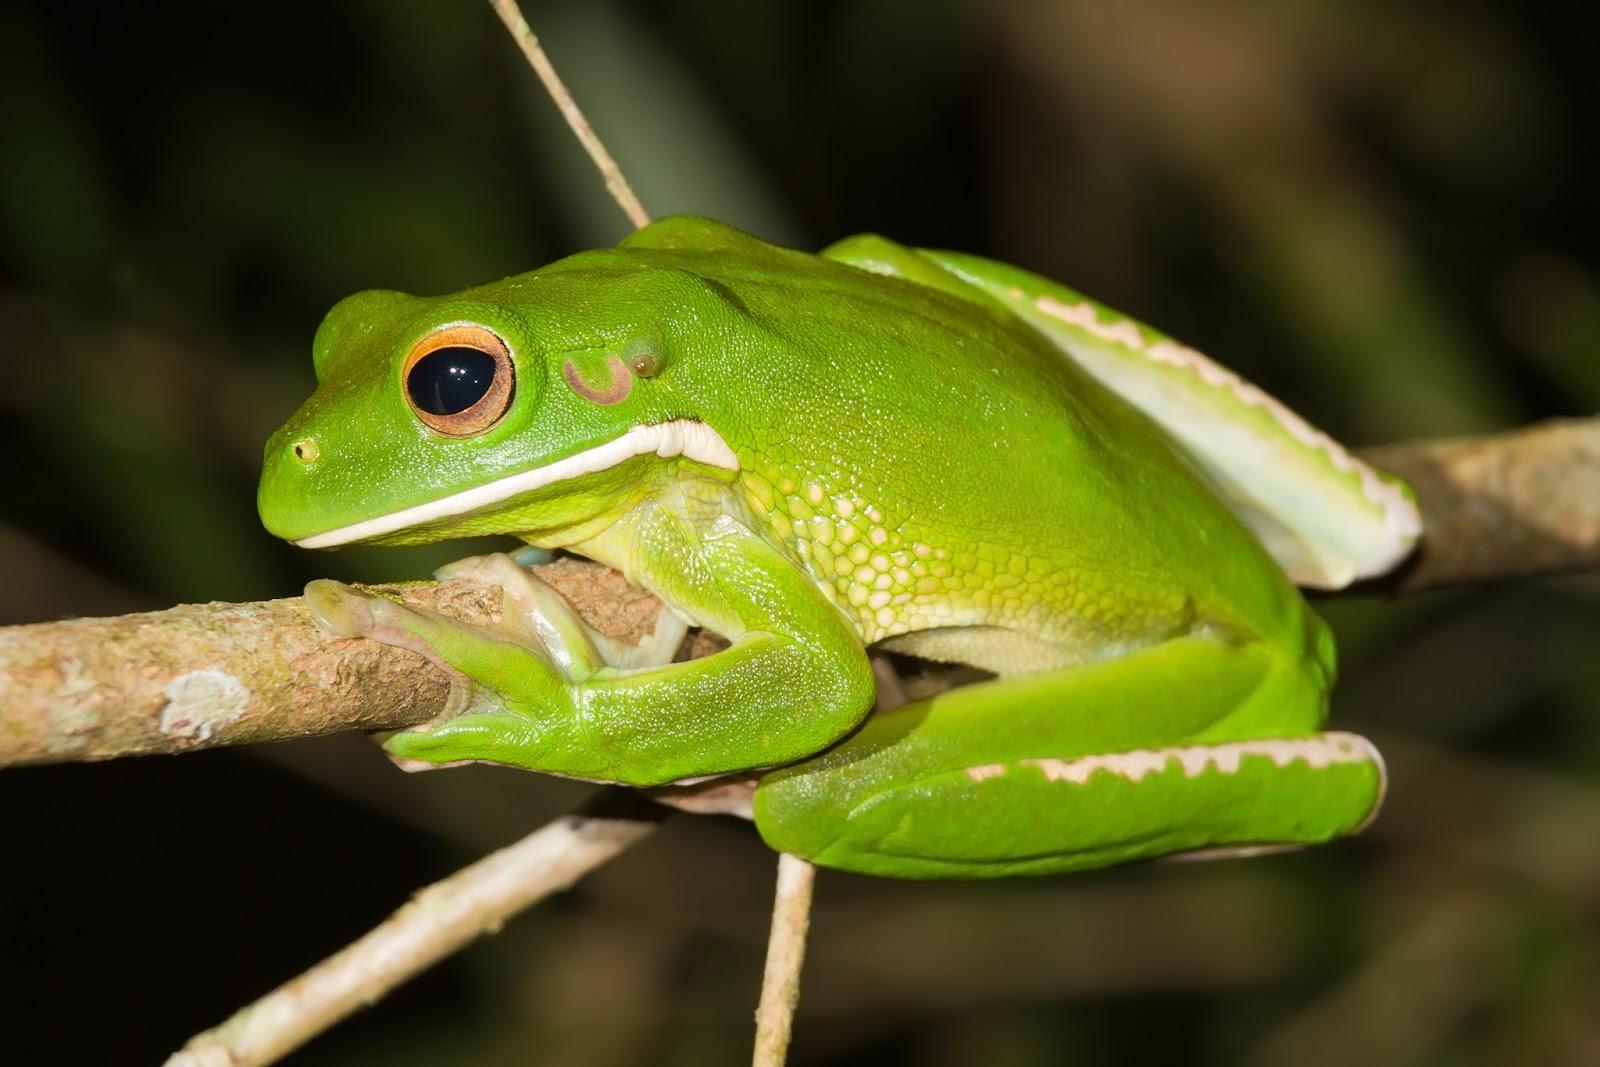 Amphibians: Litoria infrafrenata - Julatten